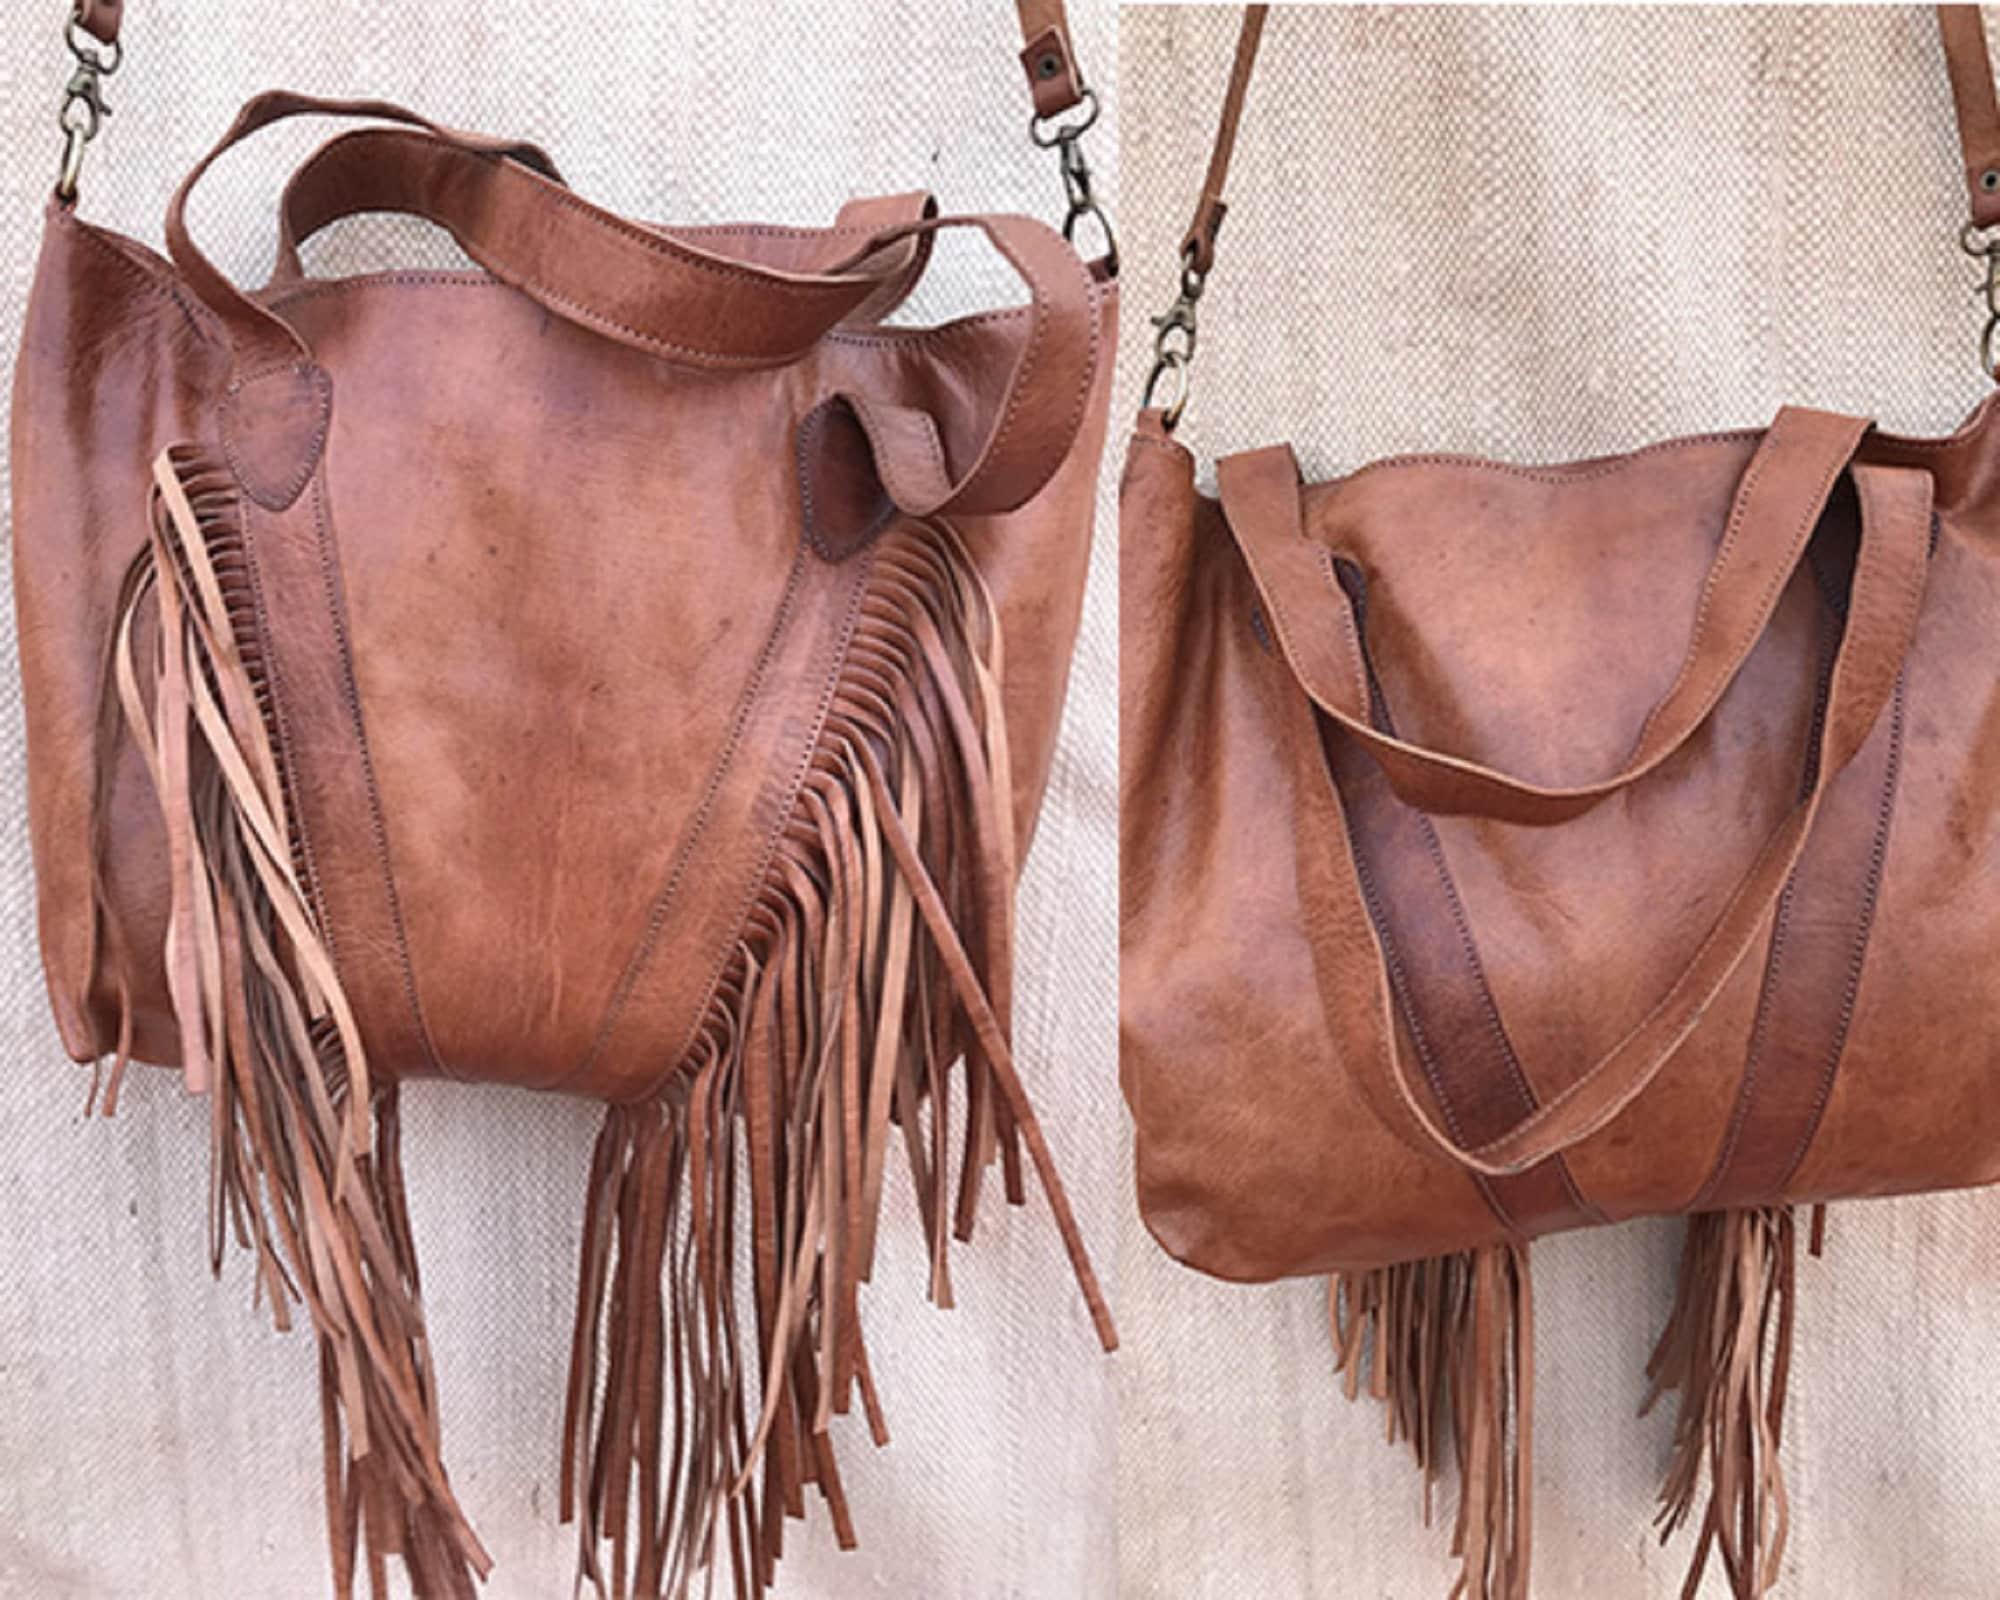 New Fringe purse , bridesmaid Leather bag , Leather Hobo Purse, Leather Tote Bag, Western Gypsy bag, Genuine Leather Handbag Wedding gift